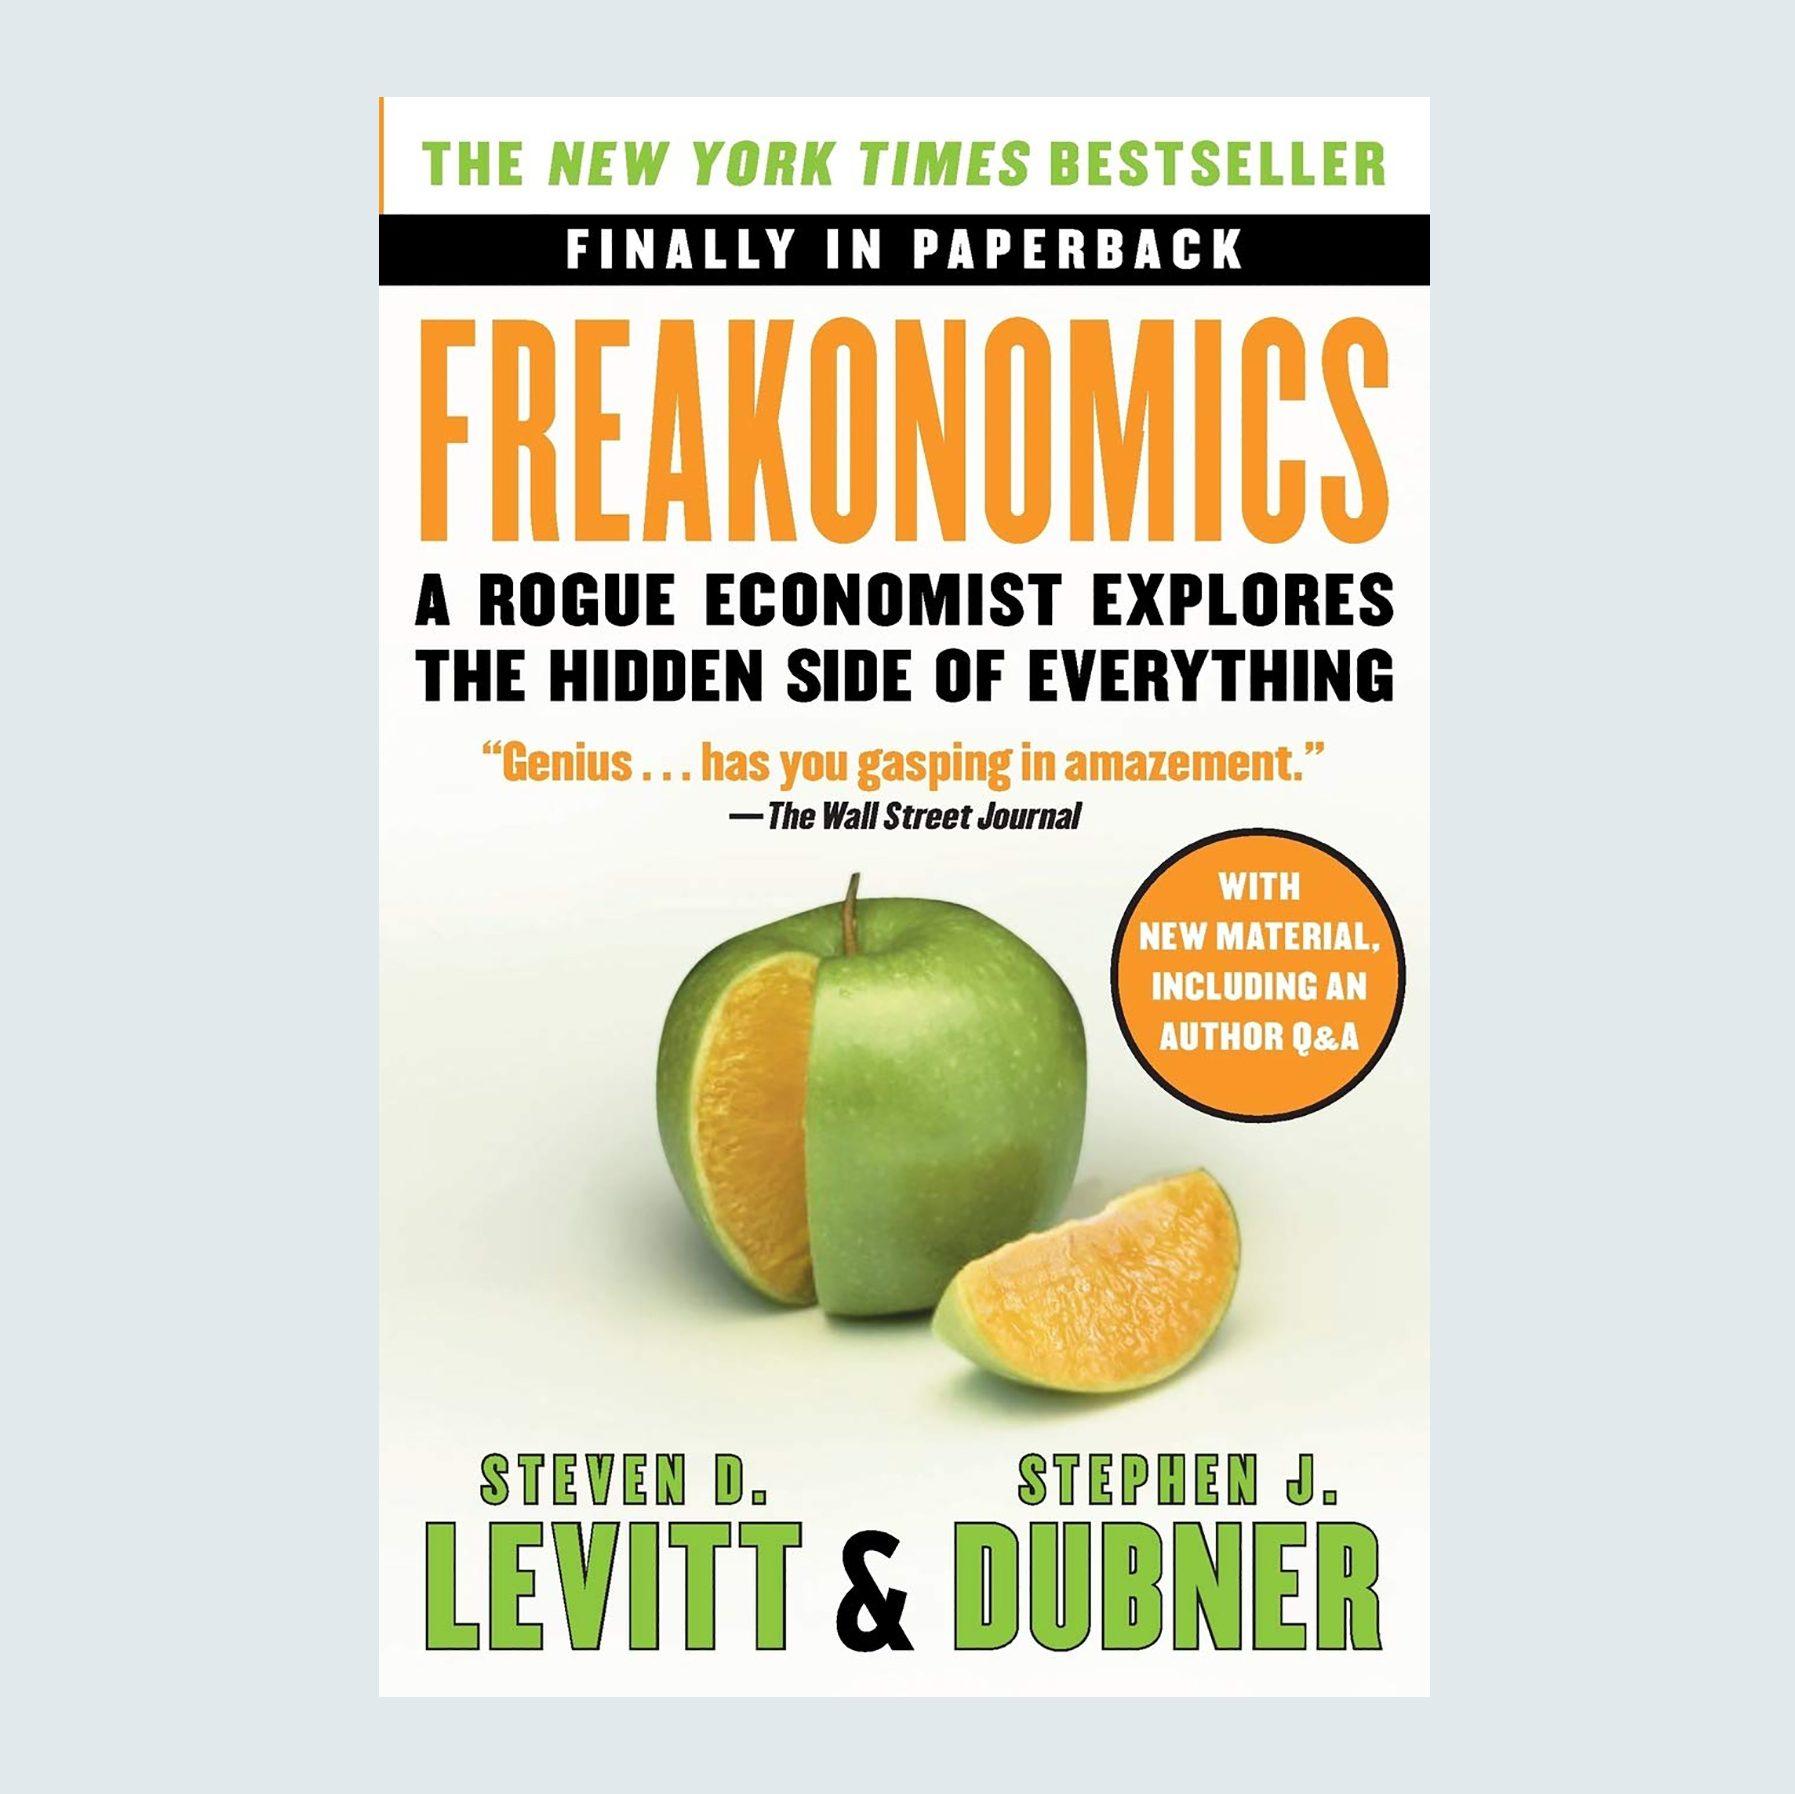 Freakonomics: A Rogue Economist Explores the Hidden Side of Everything by Steven D. Levitt and Stephen J. Dubner